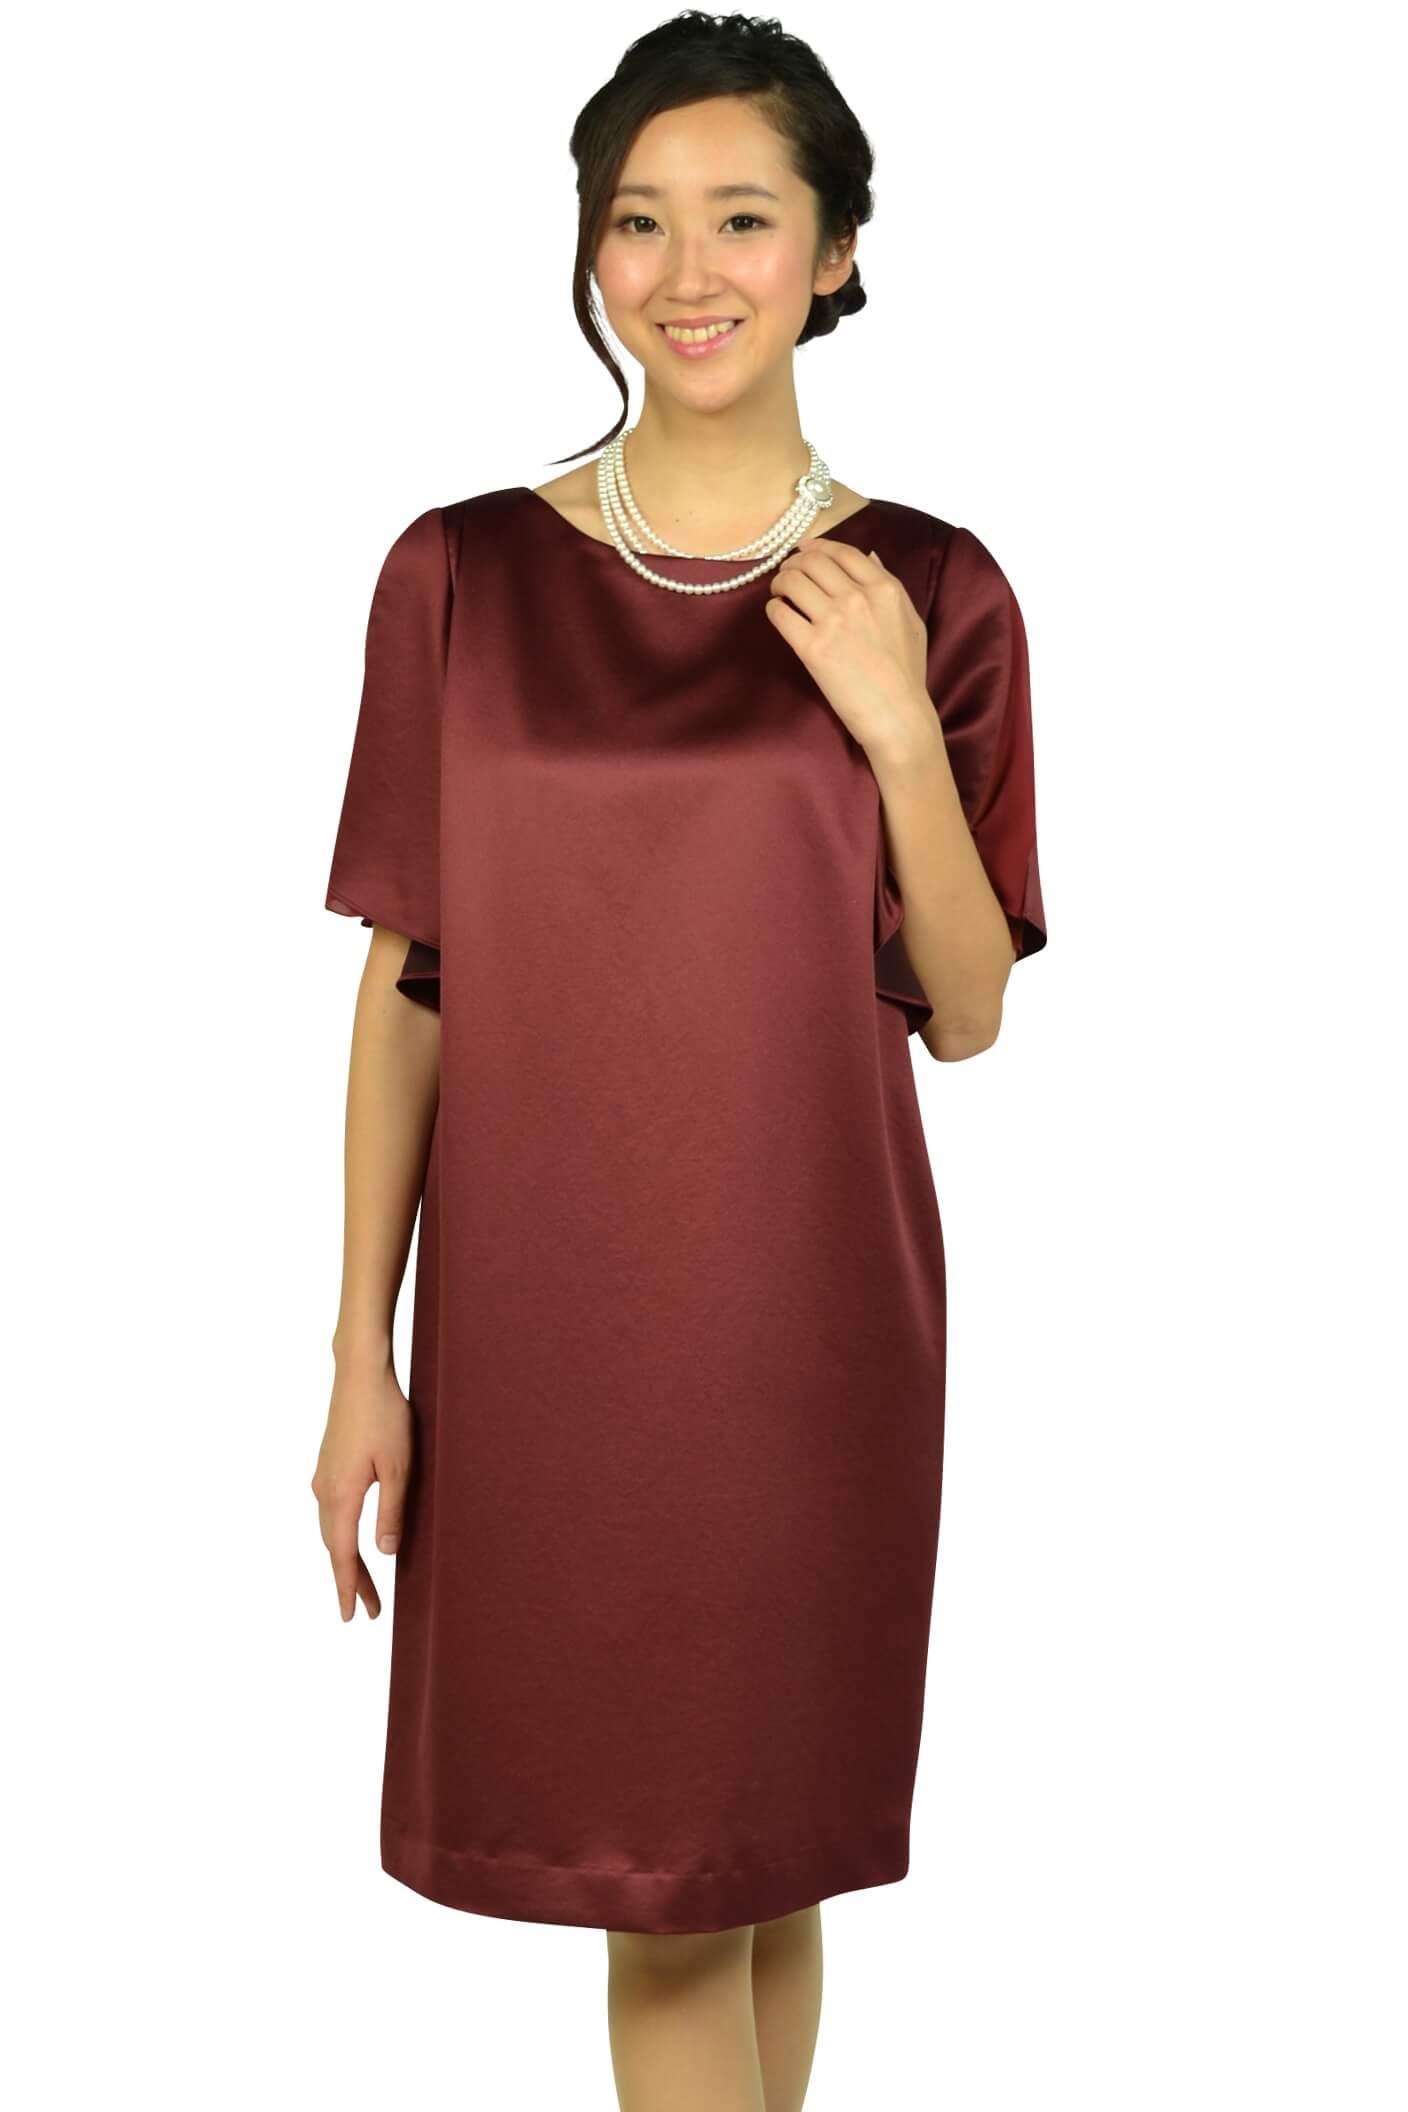 eed17c1979bce 母親の結婚式洋装 選び方ポイントと会場・雰囲気別にドレスを紹介 ...